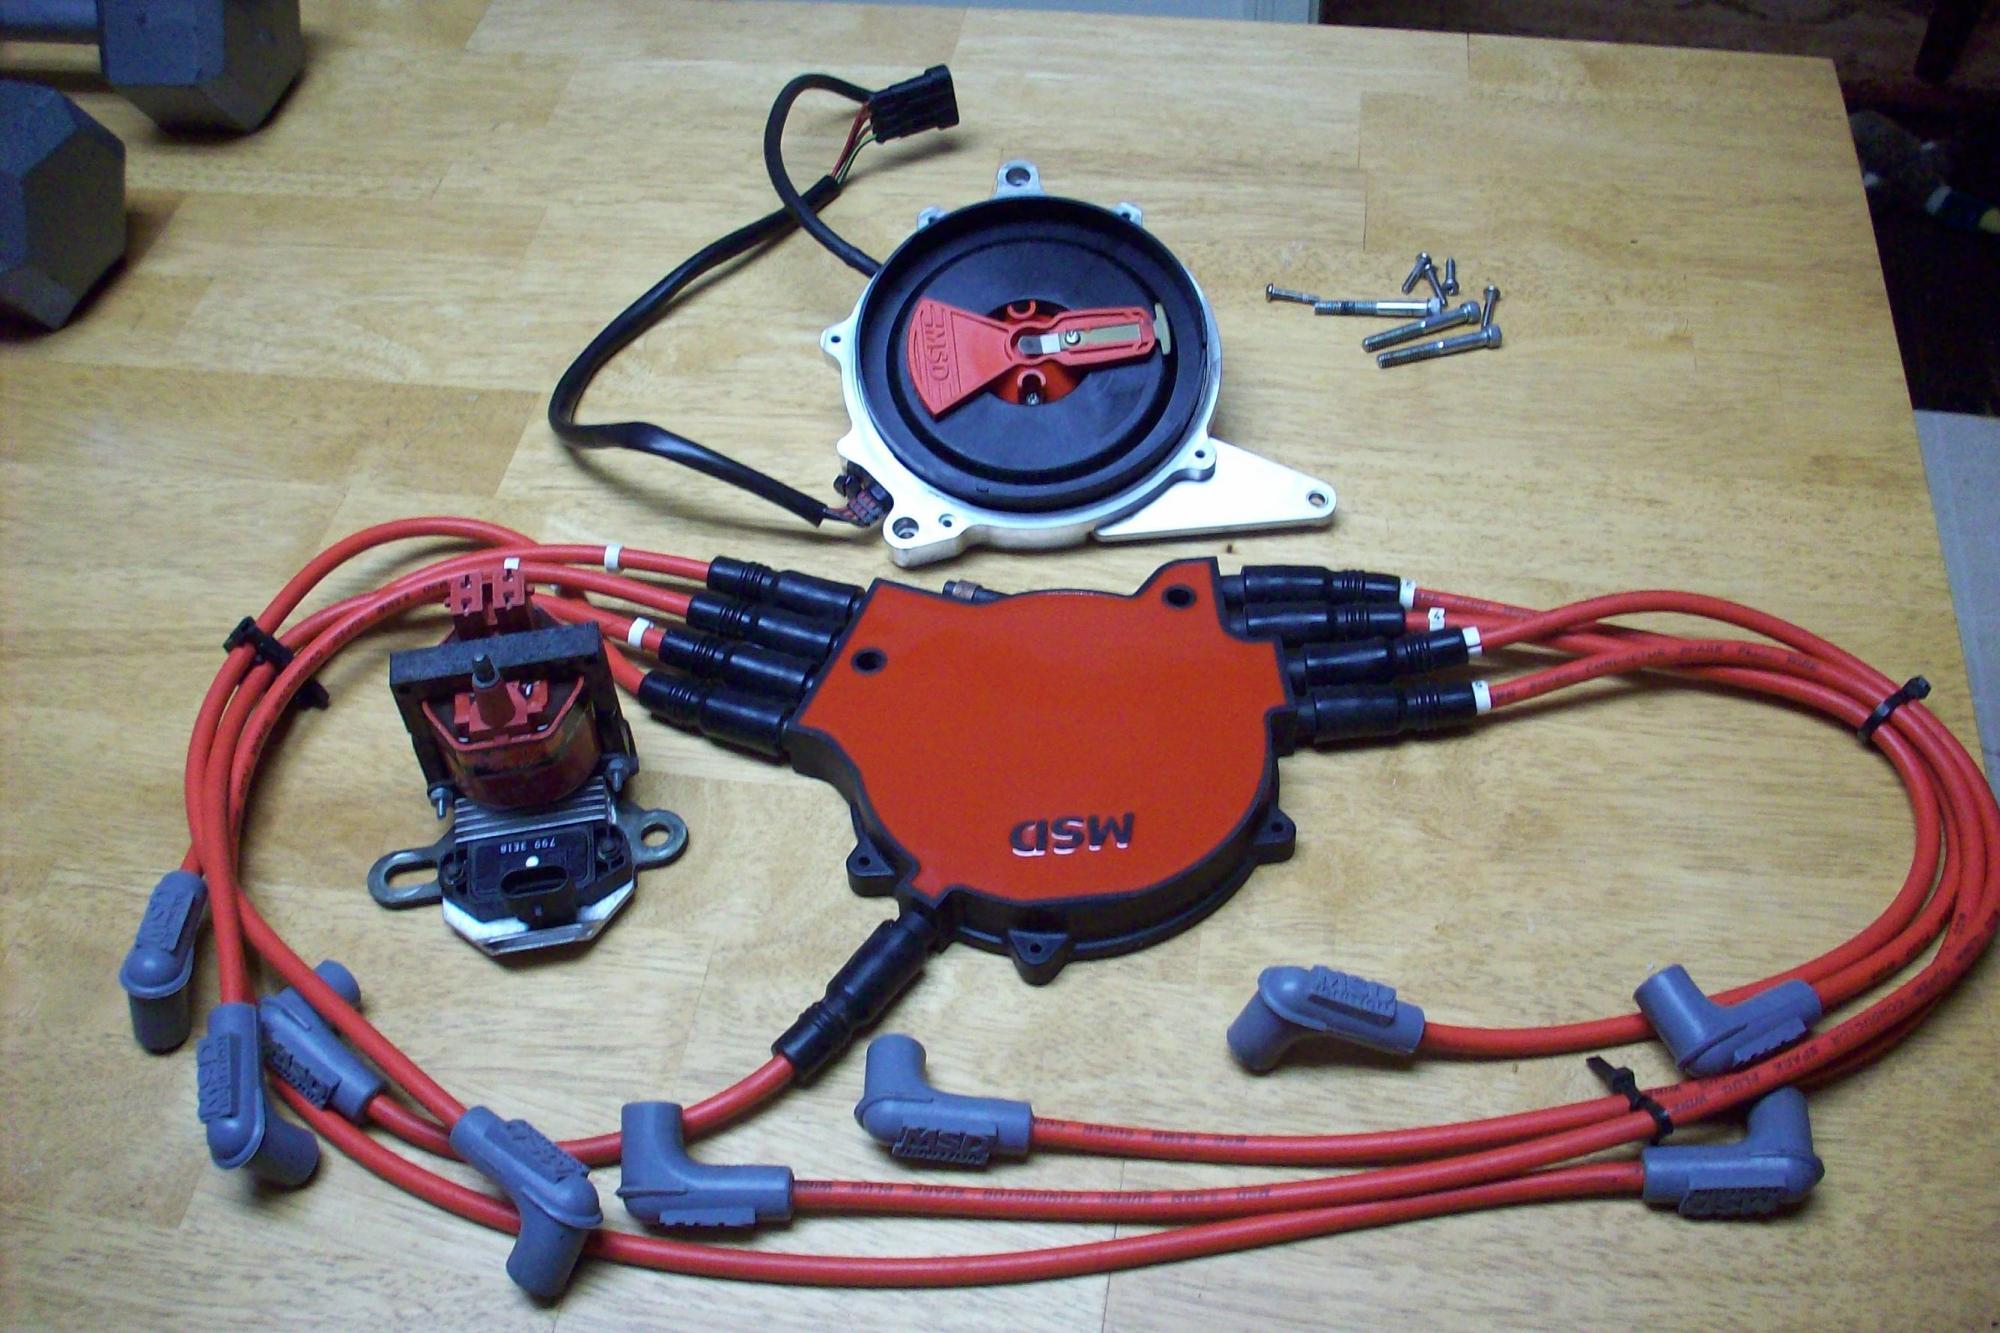 hight resolution of 93 lt1 wiring harness 1997 camaro lt1 wiring harness 1995 lt1 non vented msd opti msd wires